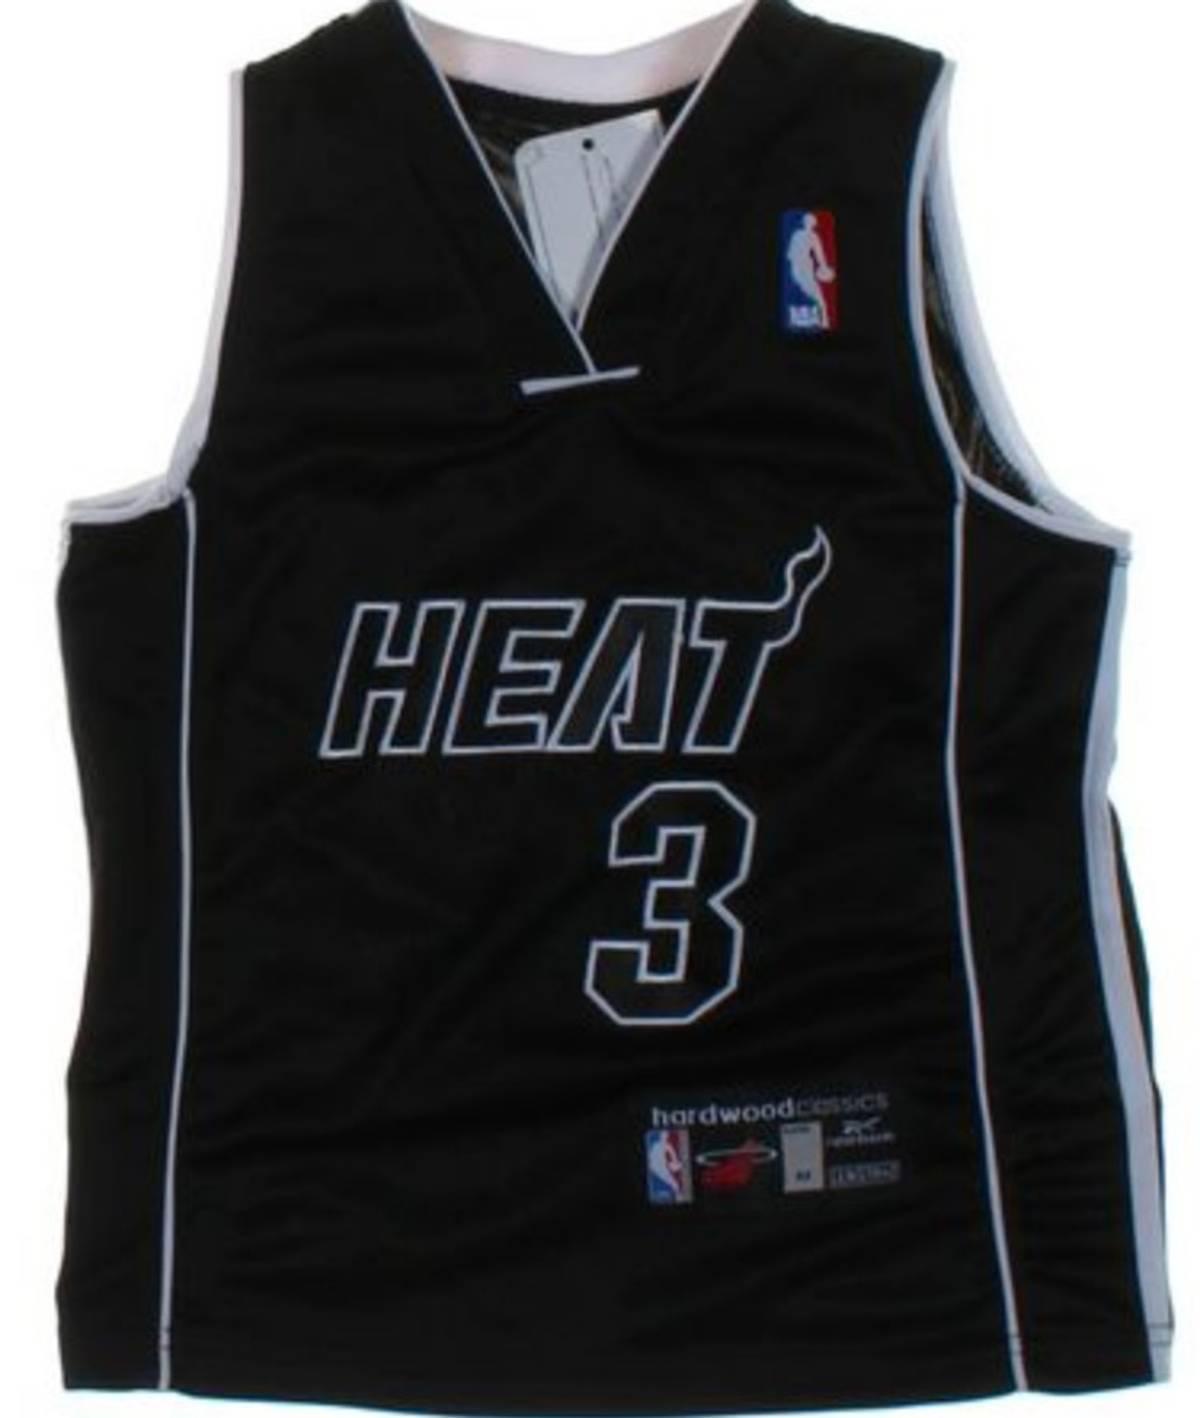 Reebok Reebok Dwayne Wade Jersey Miami Heat Kids Medium Grailed